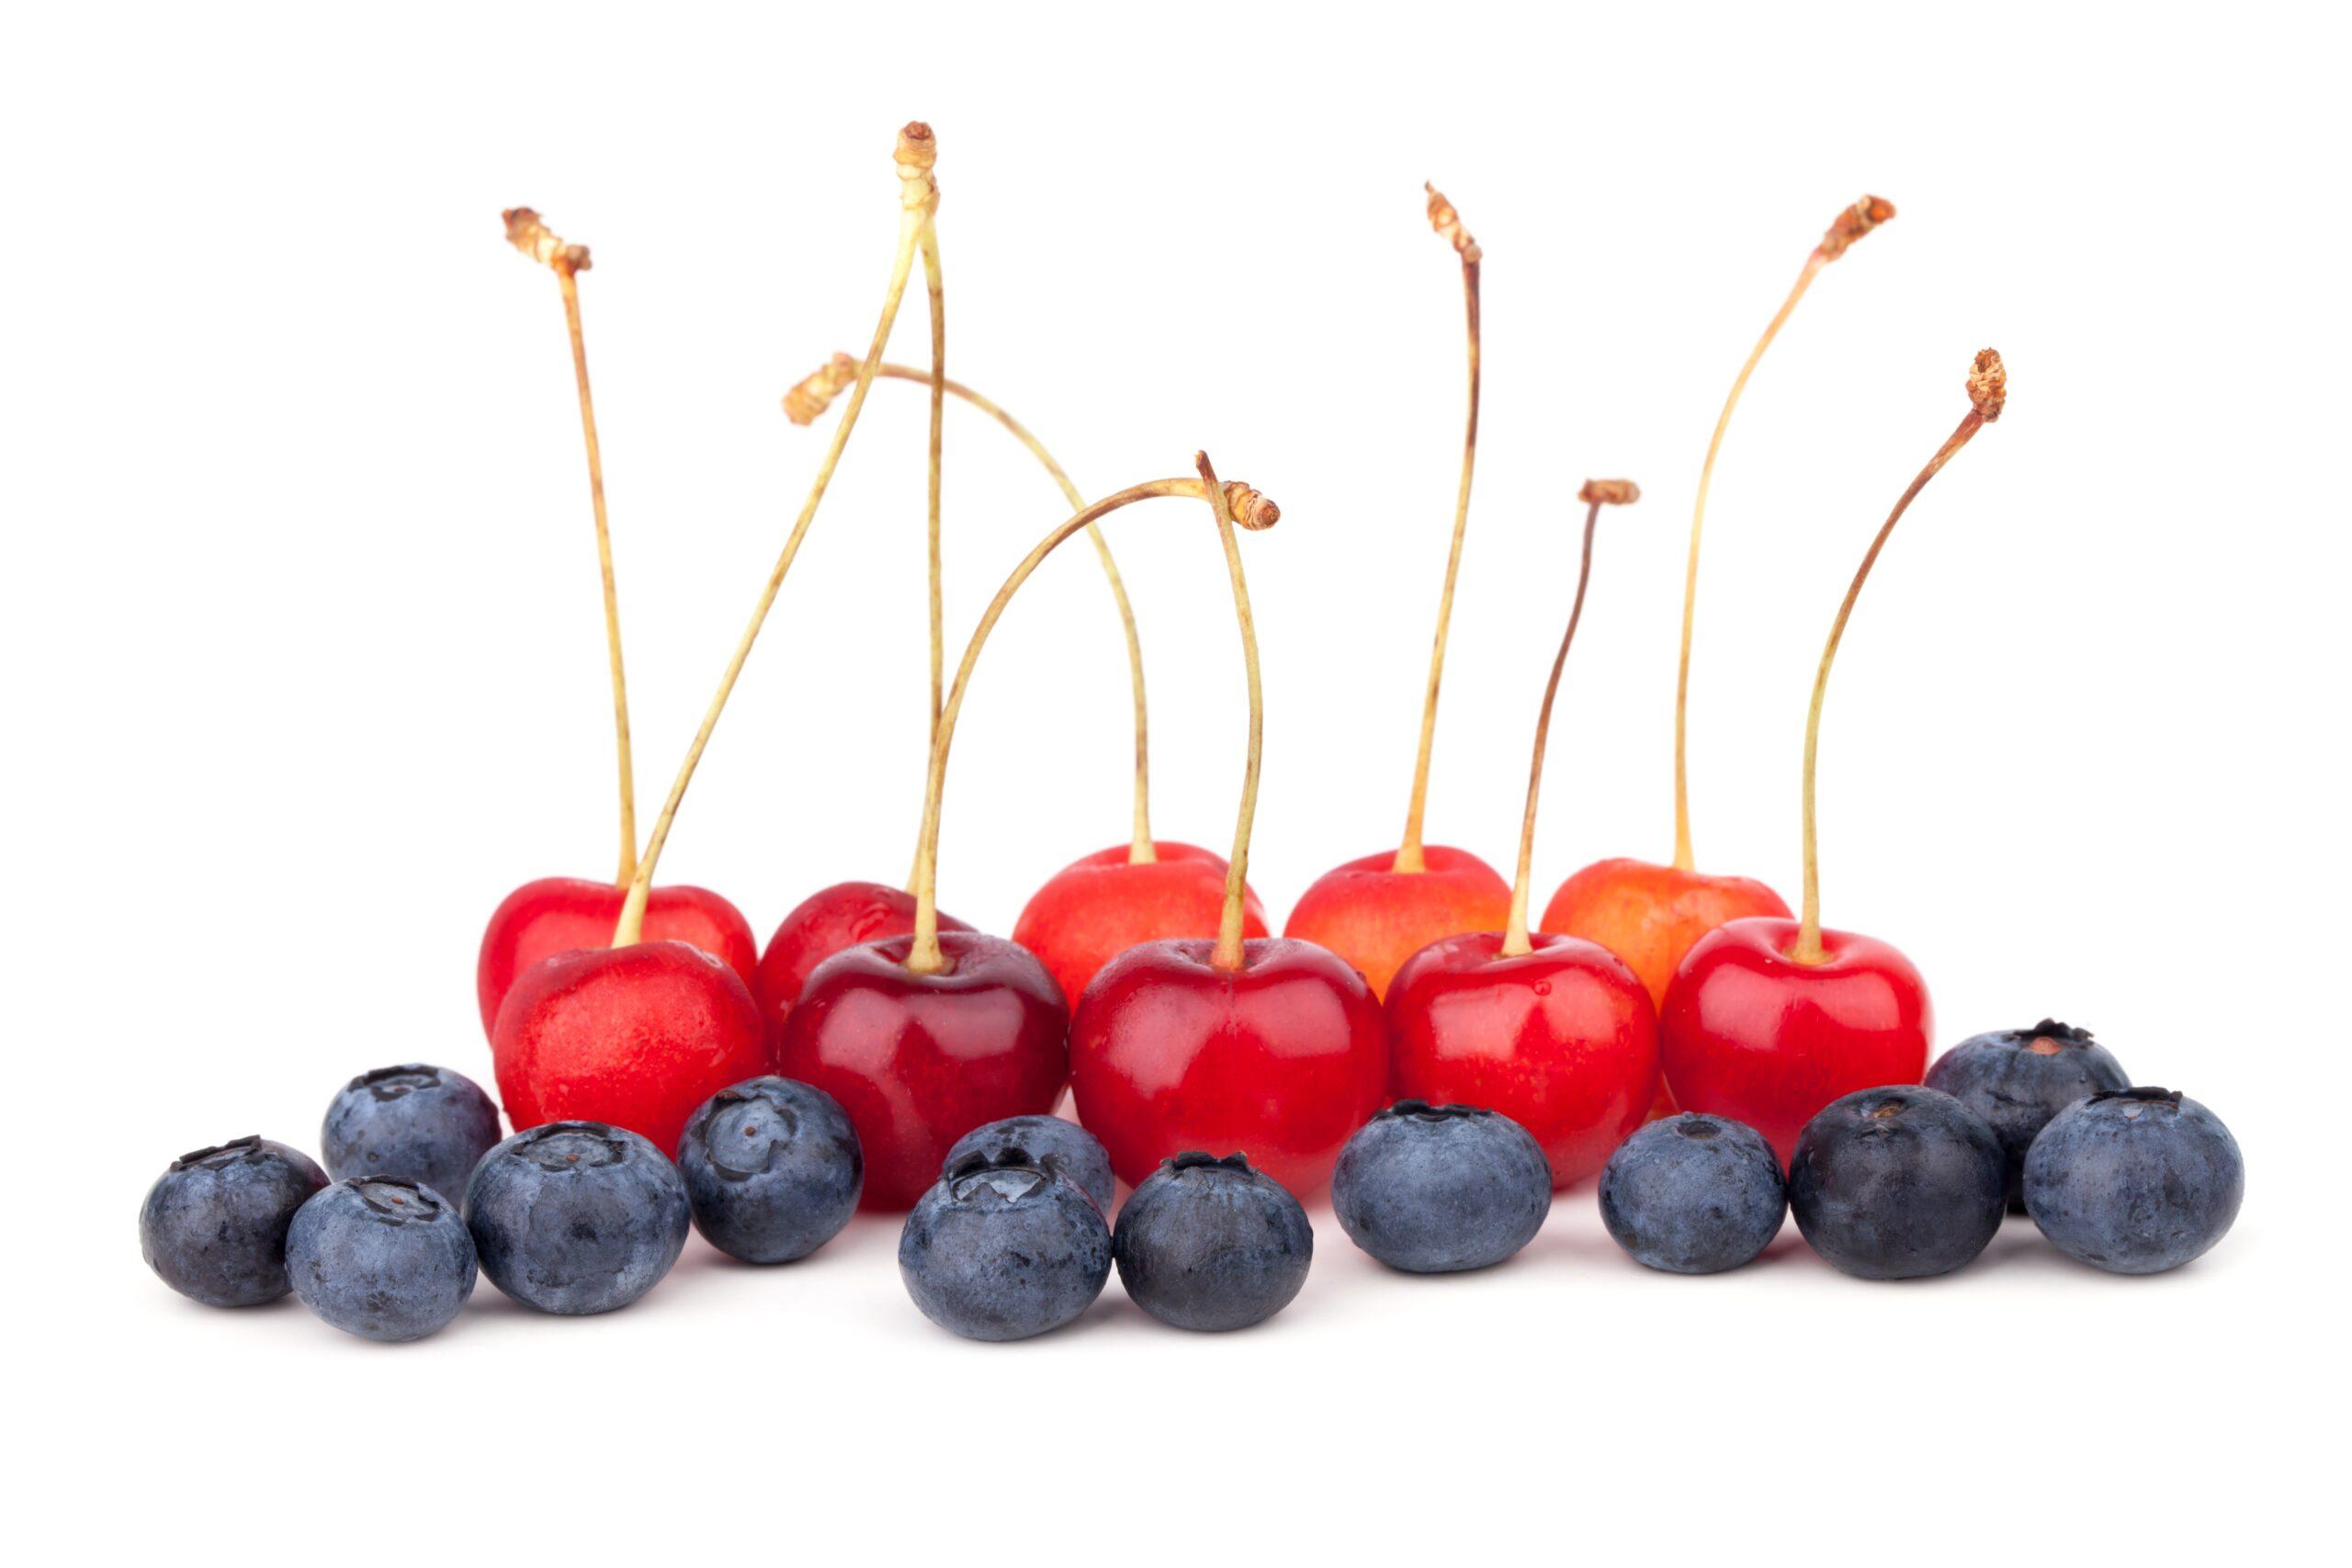 Cherry Blueberry Pie – Oh My!